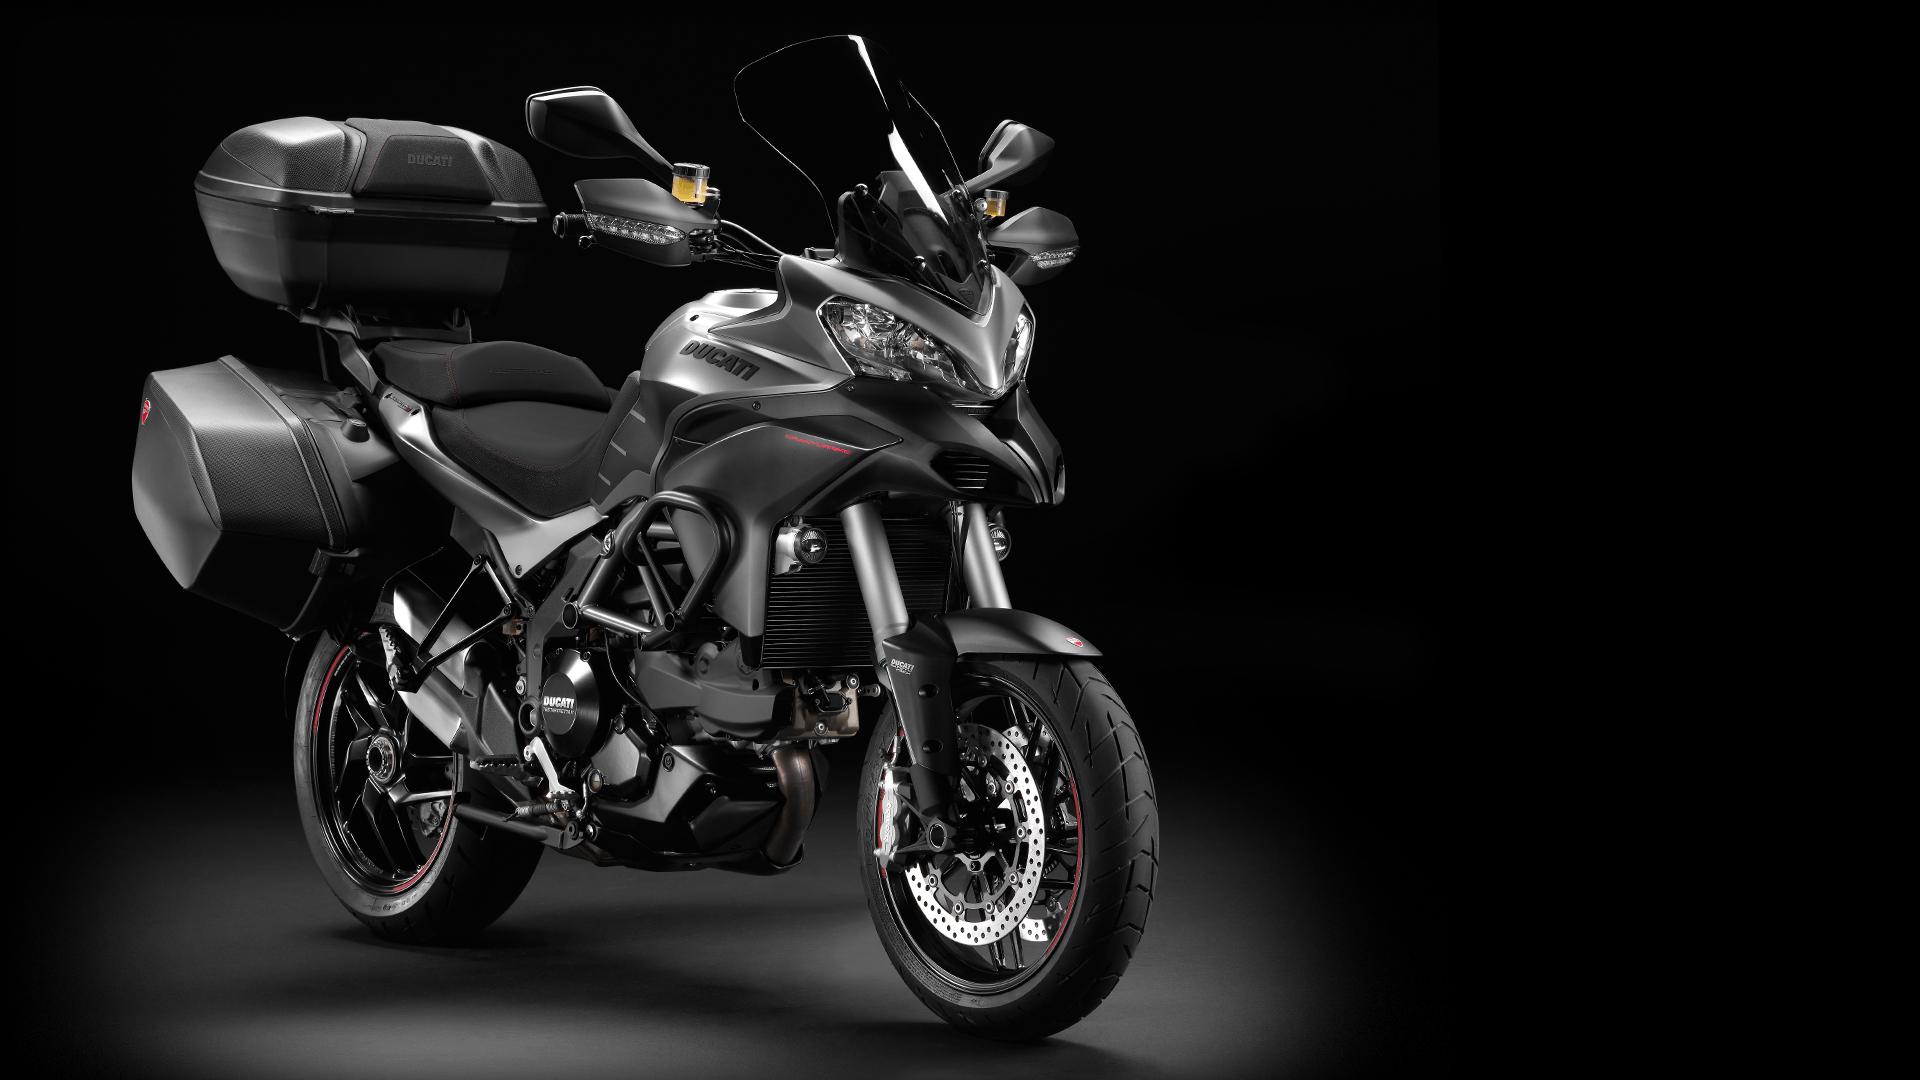 Honda CB500X With Black Background